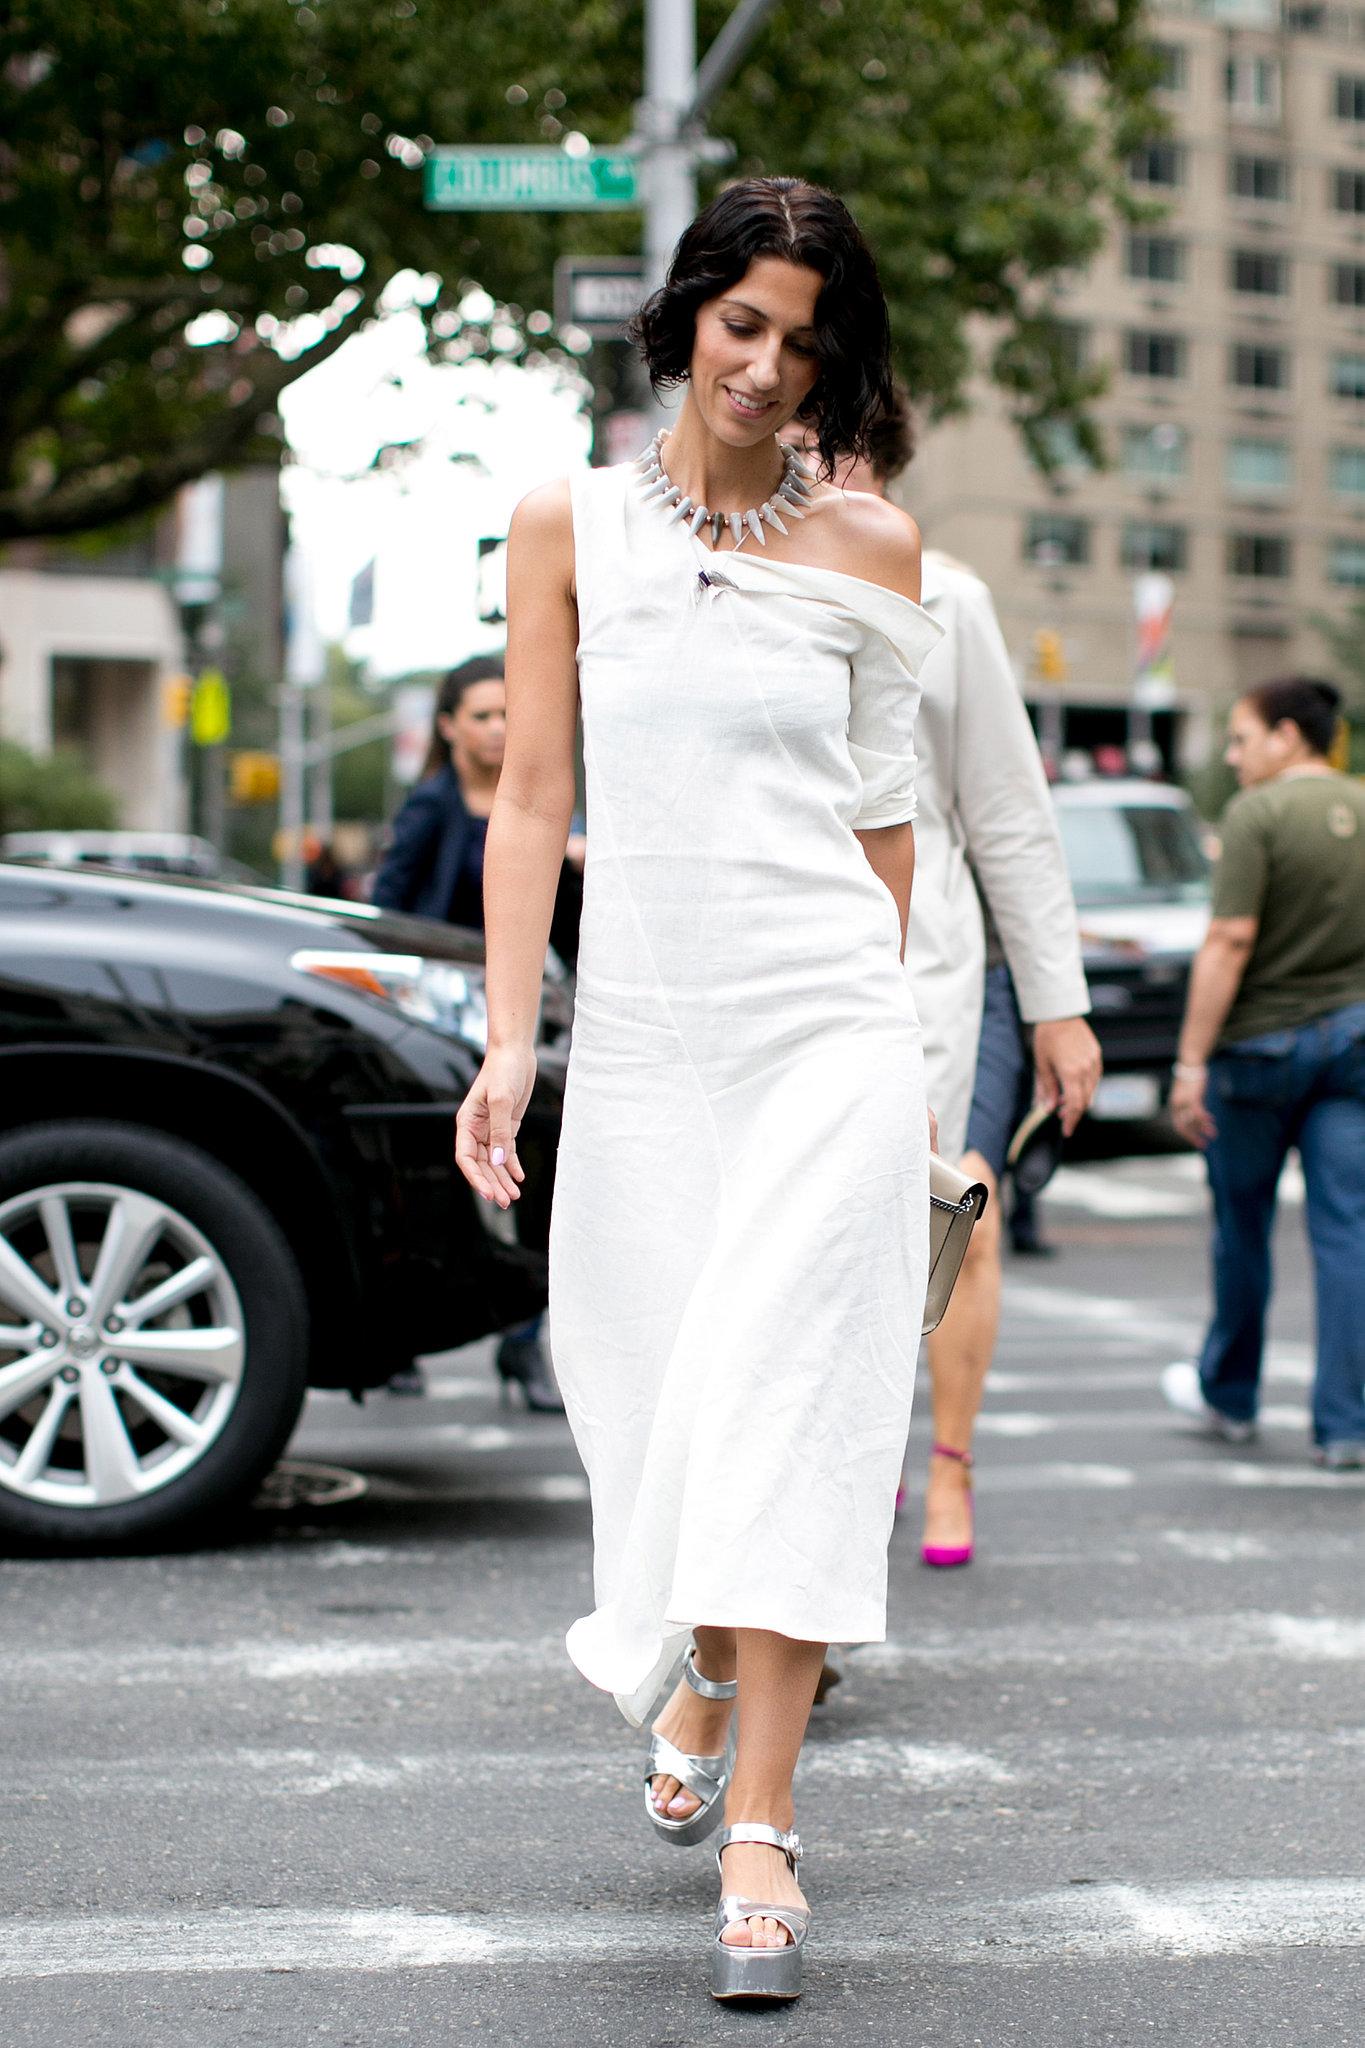 The dress said minimalist, the accessories said otherwise.